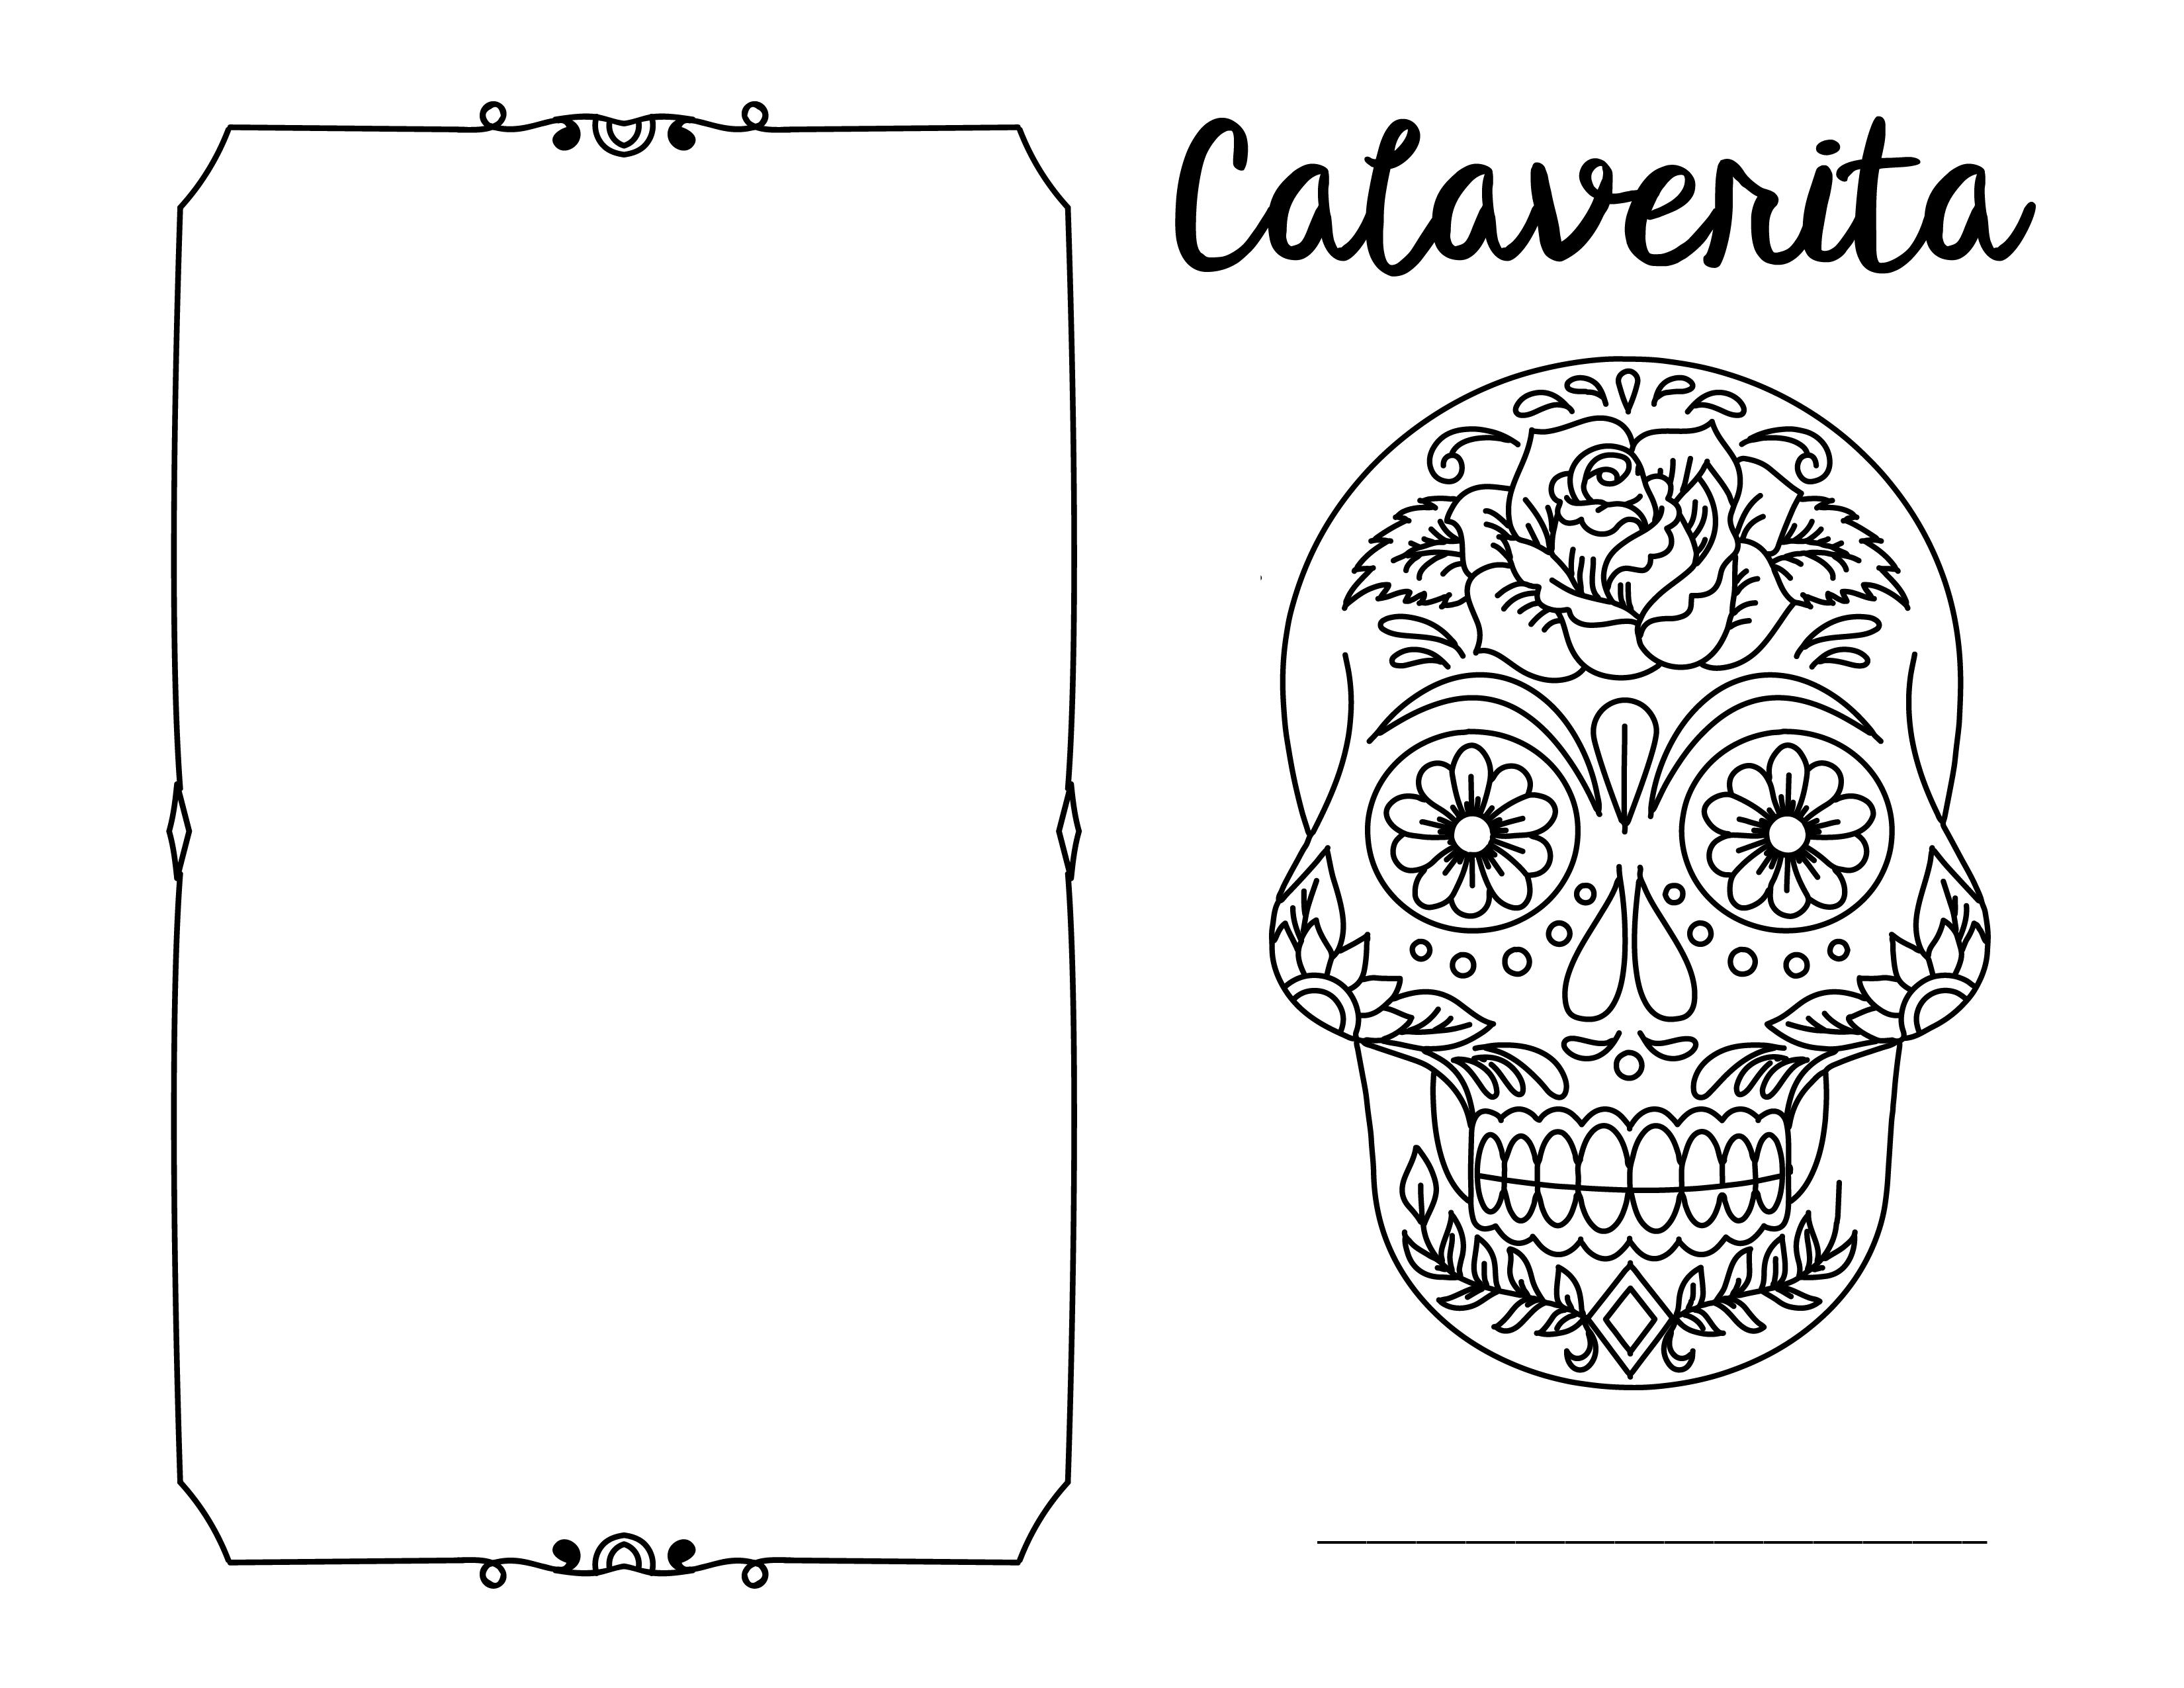 Image Result For Calaveritas Literarias Calaveras Literarias Calaveras Literarias Para Ninos Calaveras